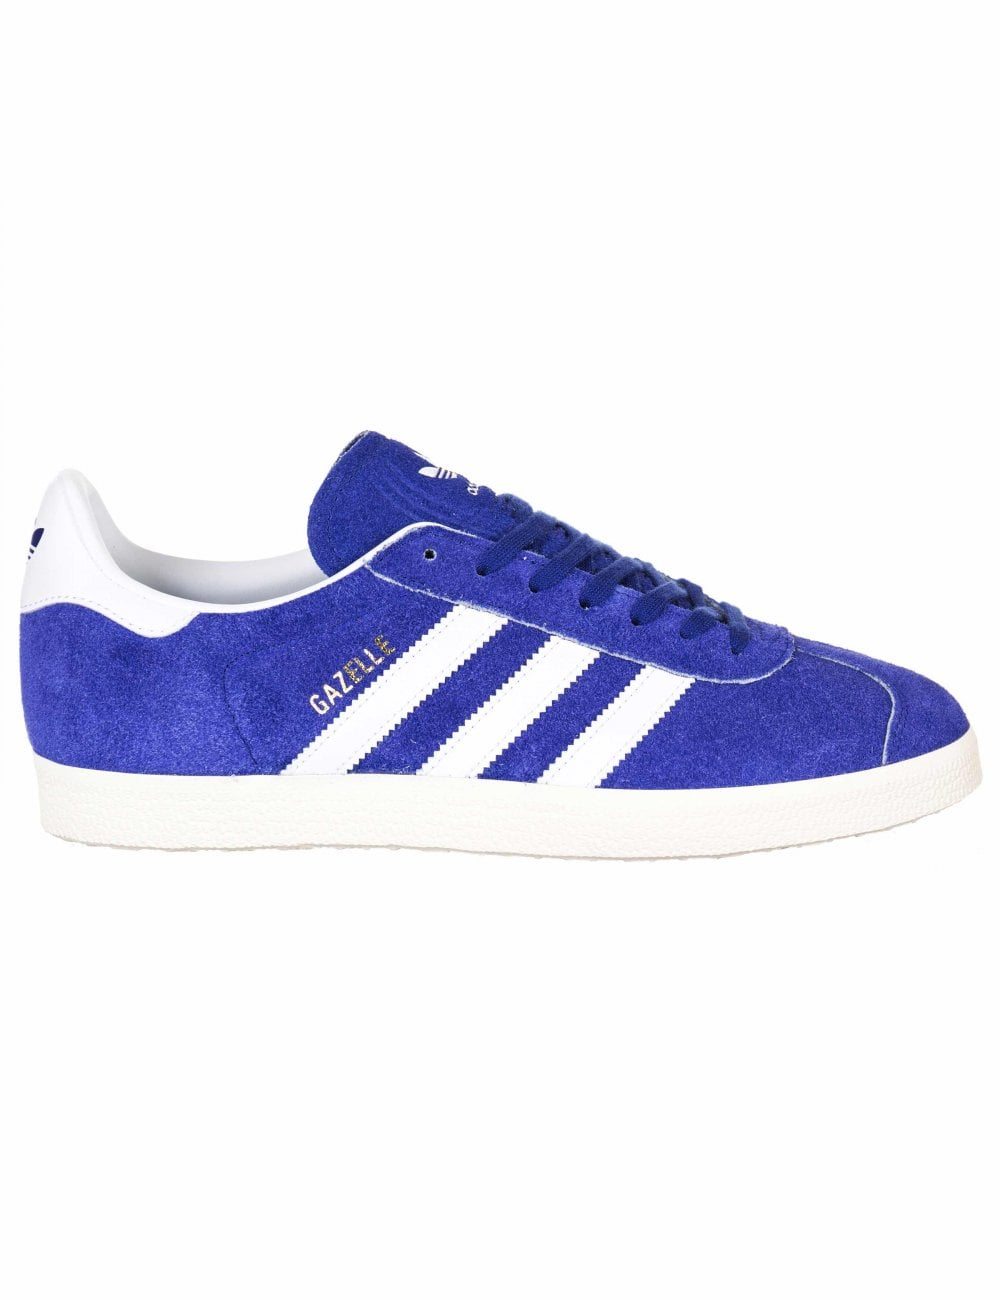 online store 7a382 50695 Gazelle Trainers - Active Blue